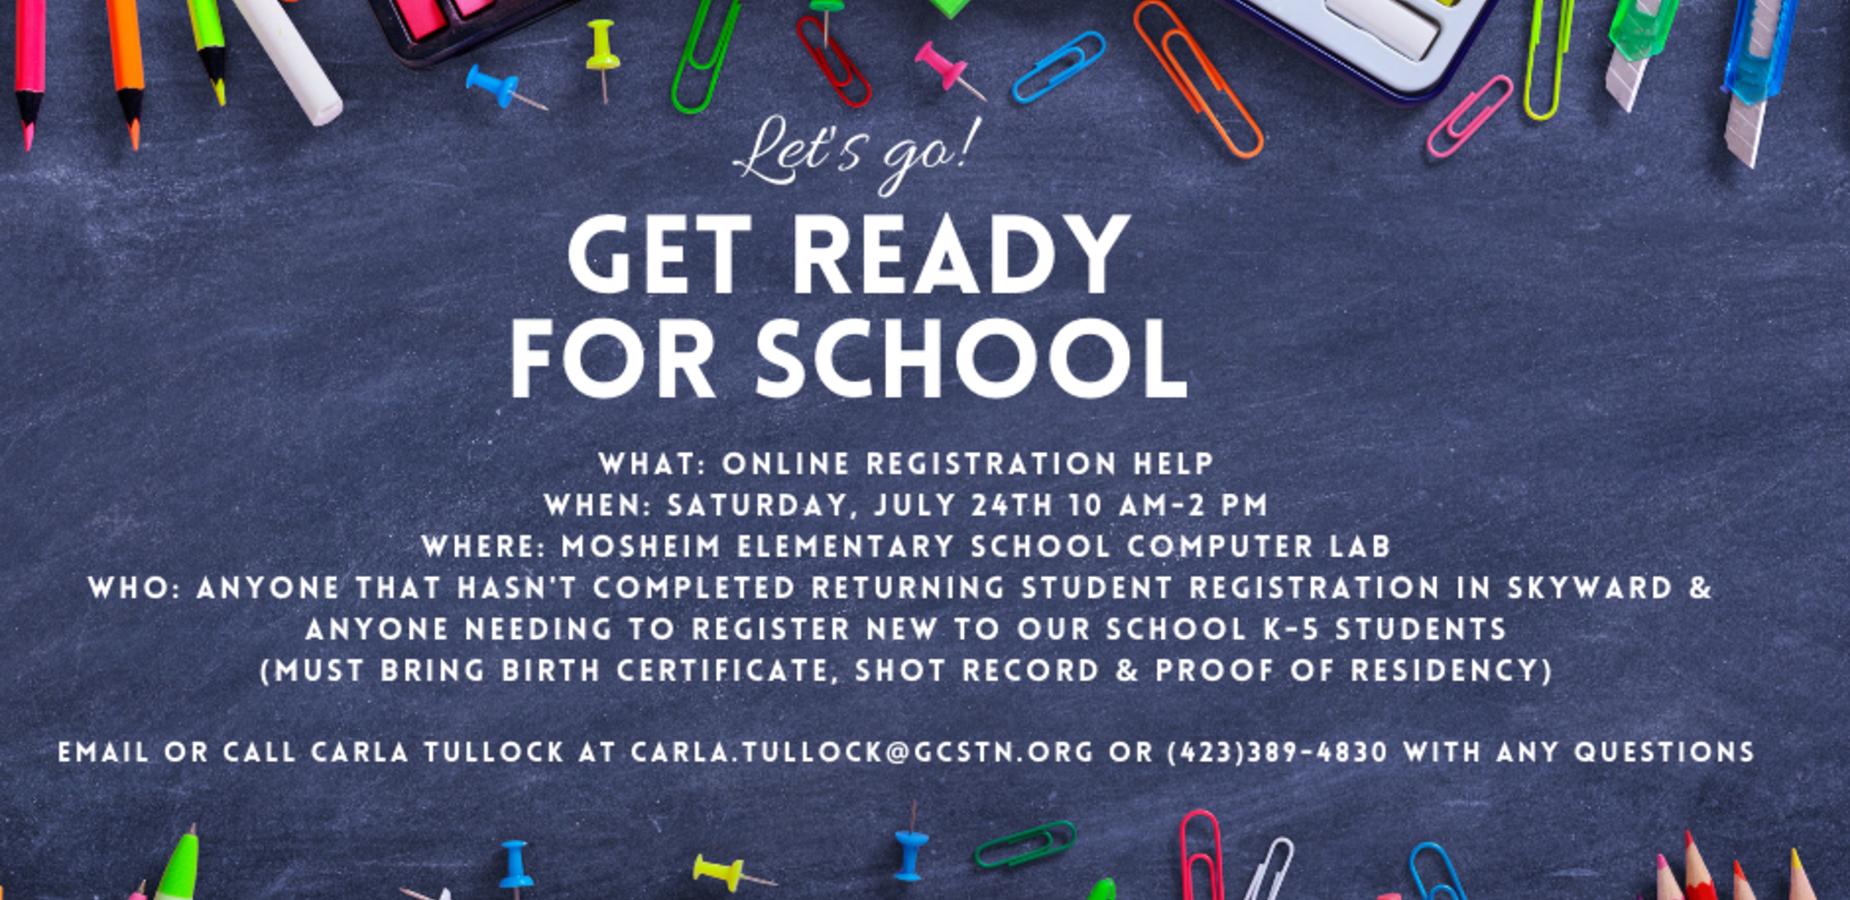 Online registration help July 24th